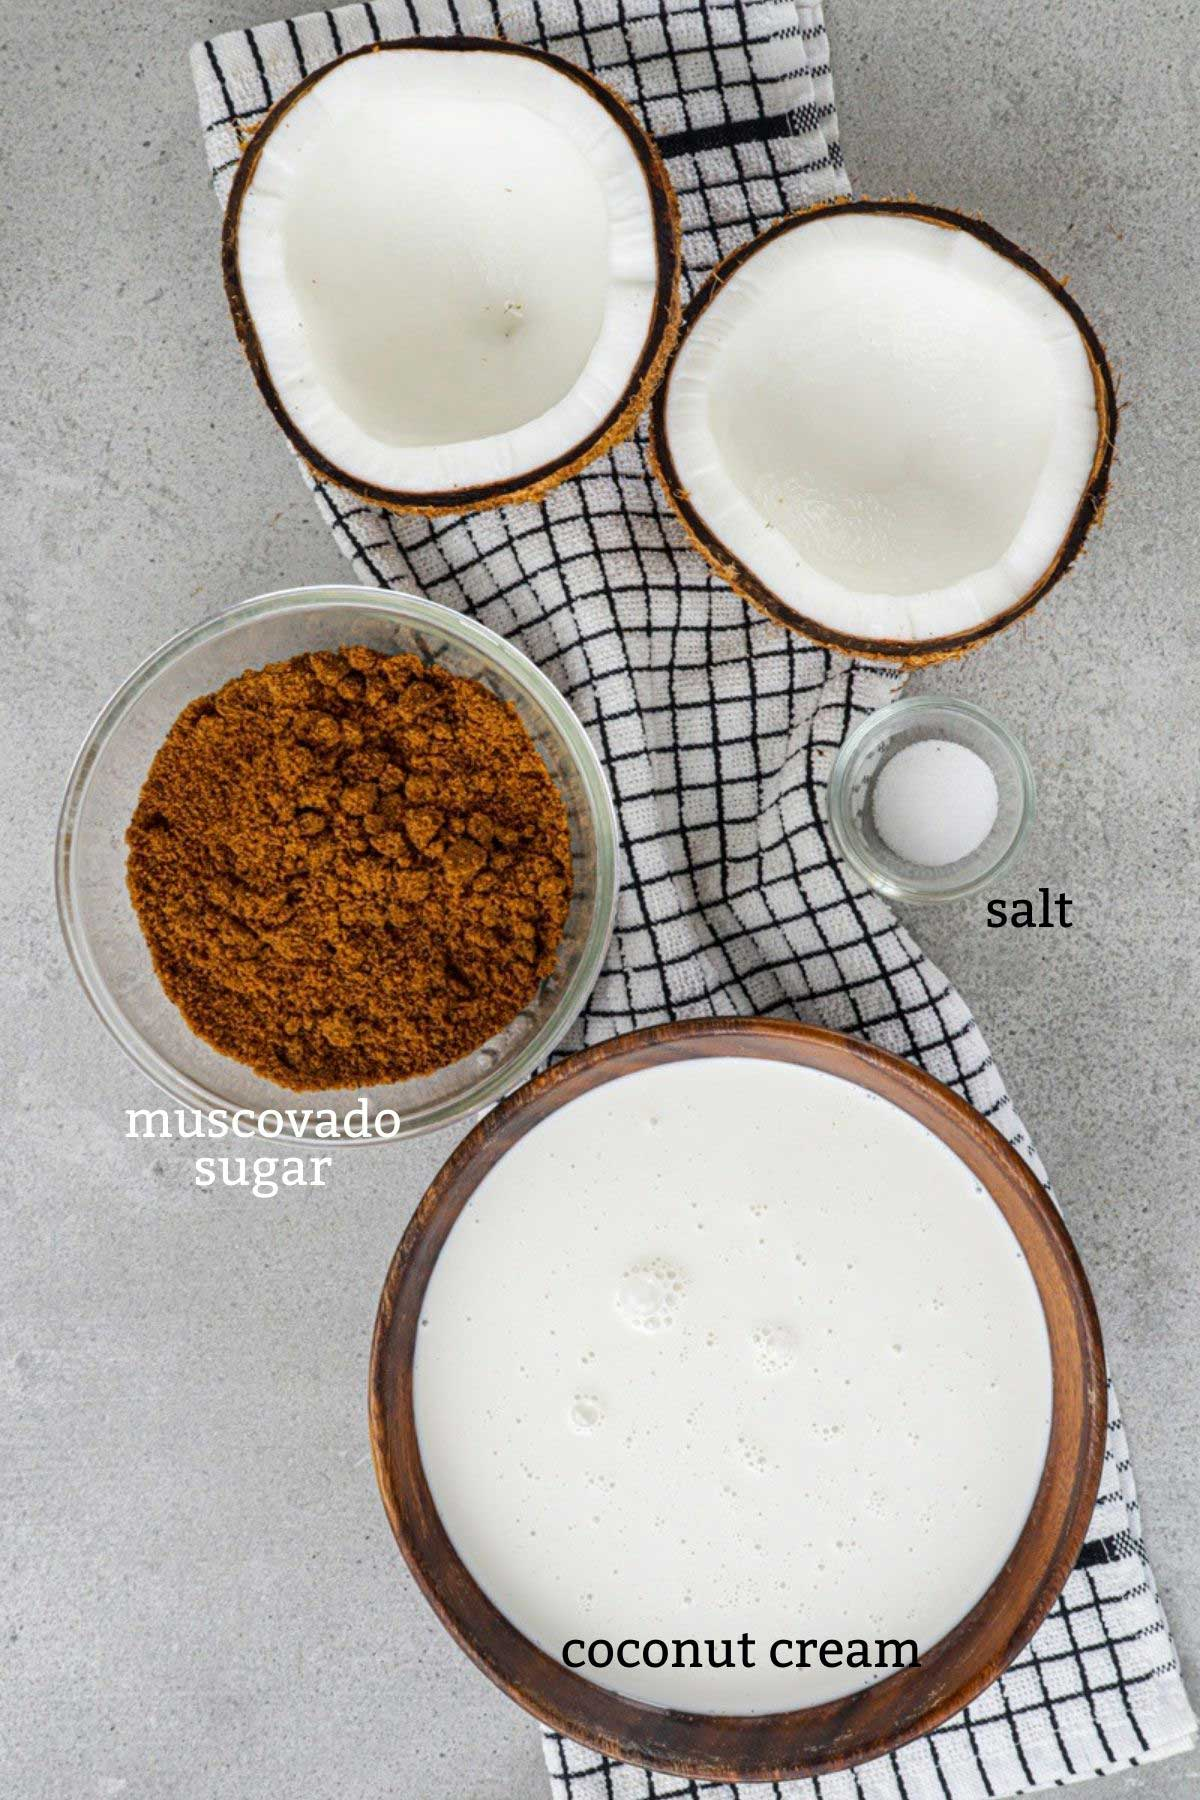 Ingredients for coconut jam